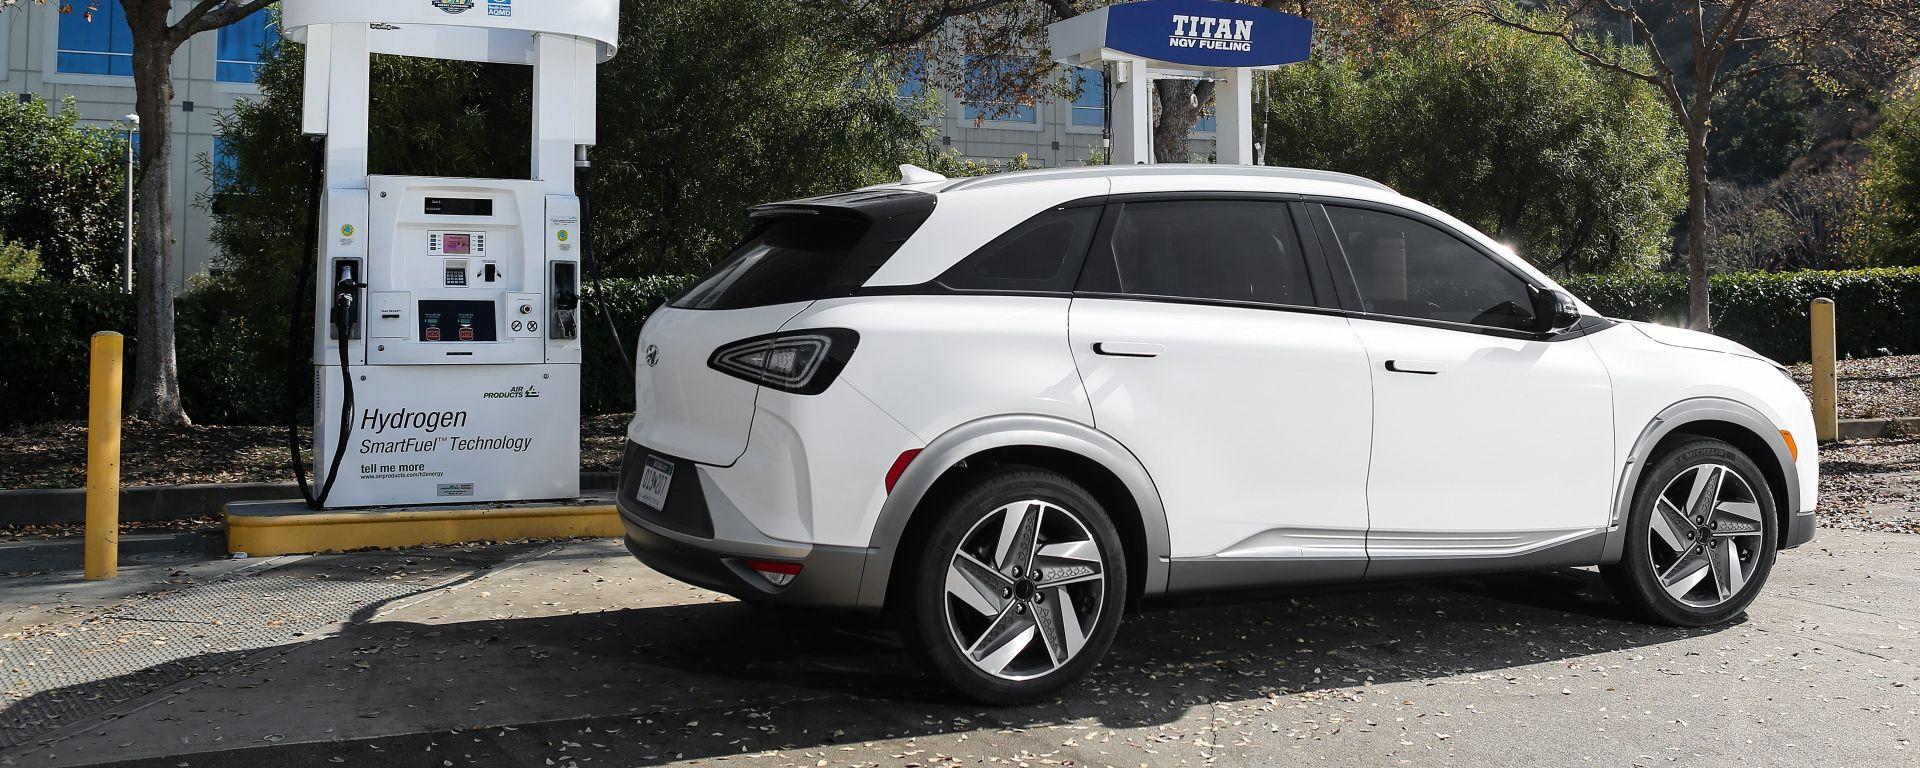 Hyundai Nexo al distributore di idrogeno